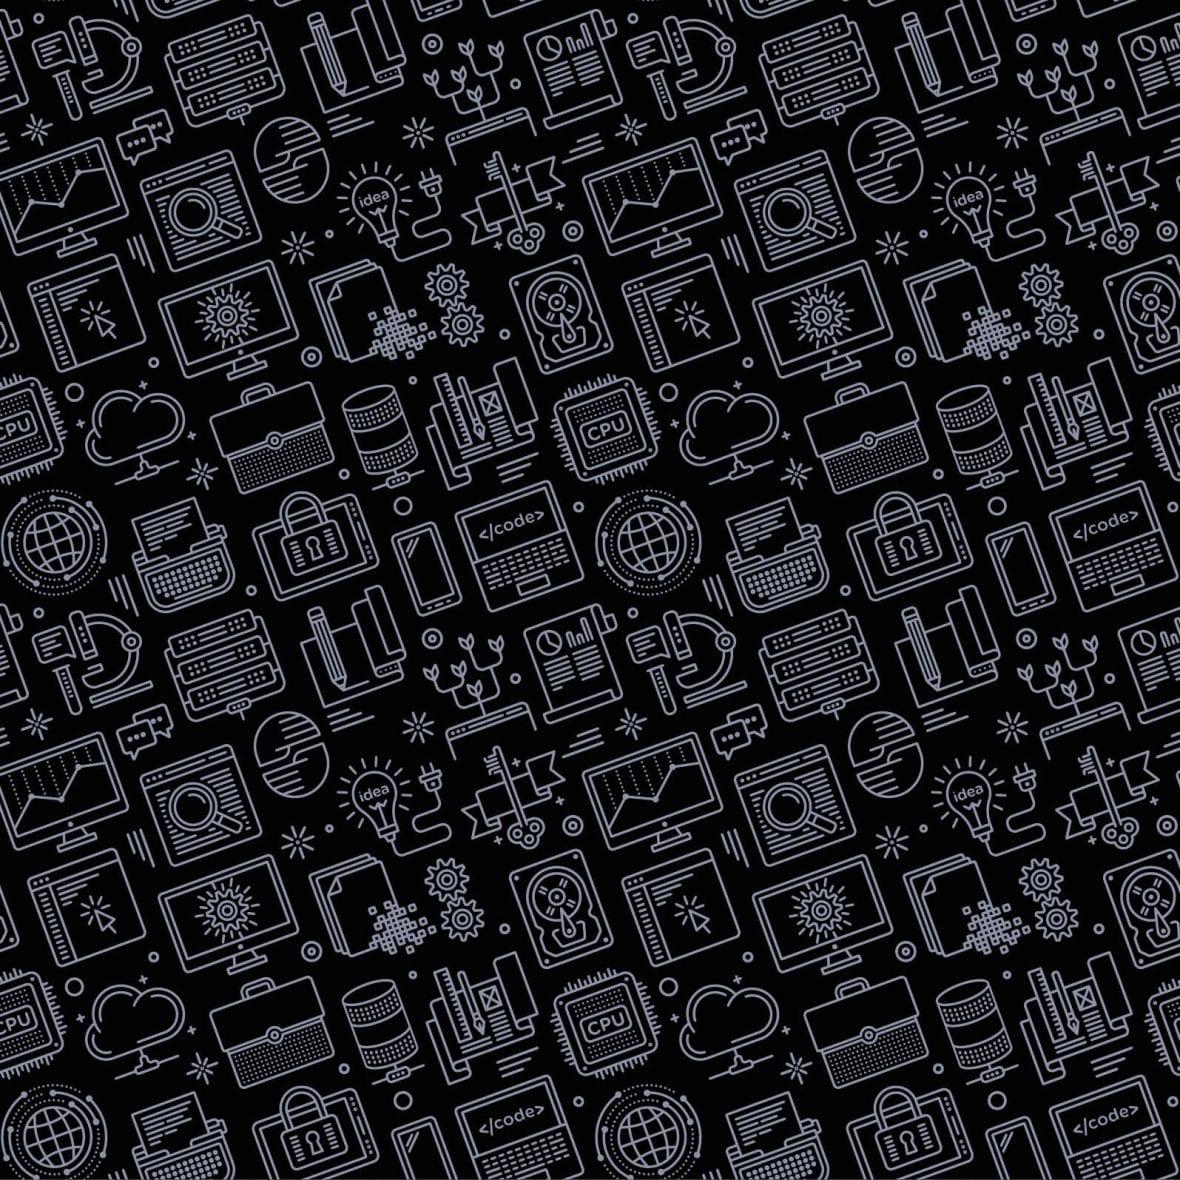 Briefing Mar19, Cybersupp cover art